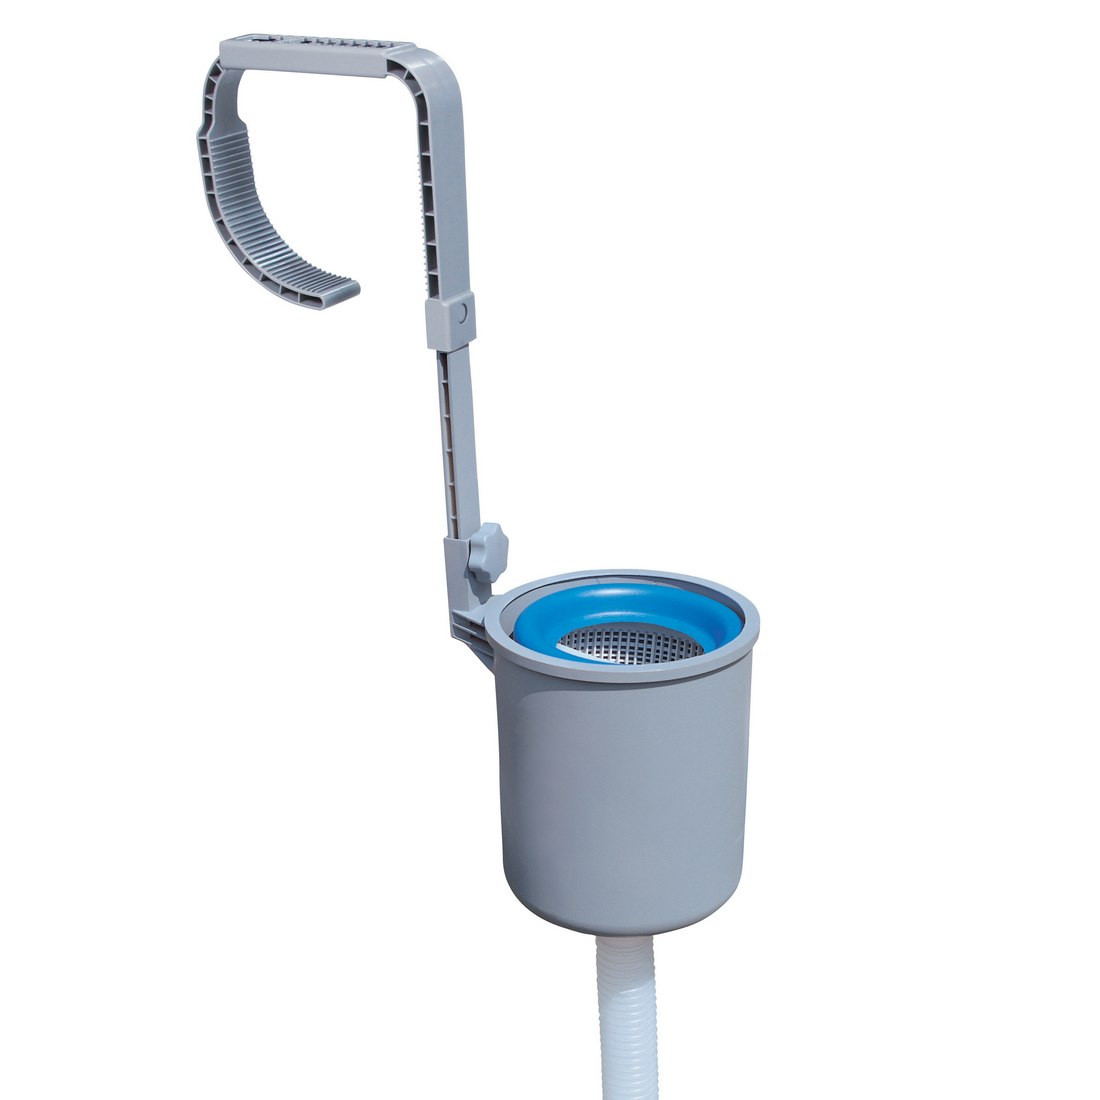 Скиммер для бассейна, BESTWAY, 58233, Пластик, Серый, Цветная коробка